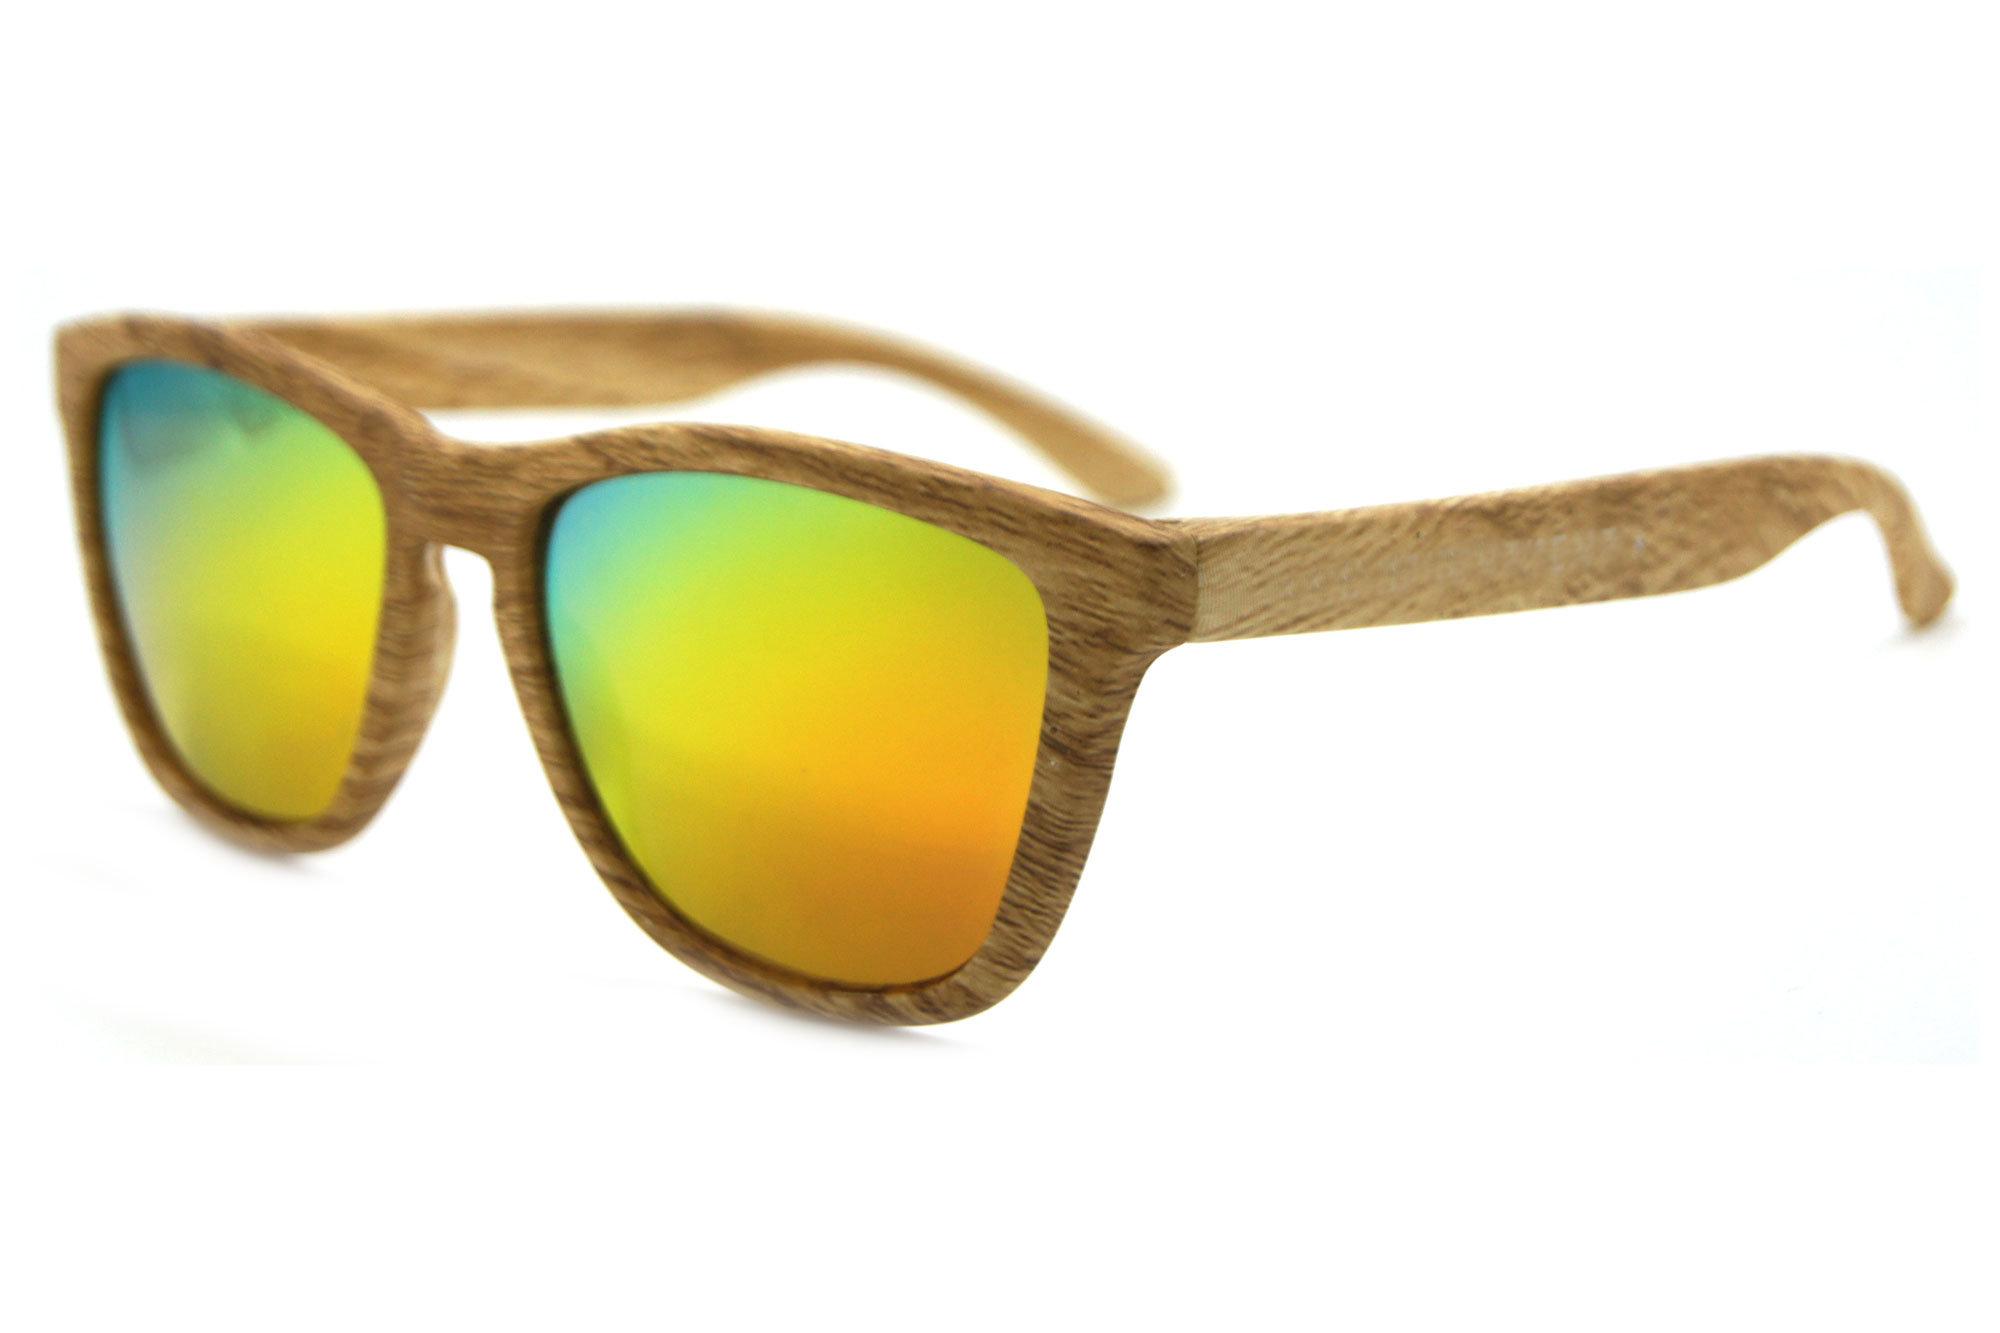 Colorful Wood Color Plastic Frame Unisex Fashion Sunglasses